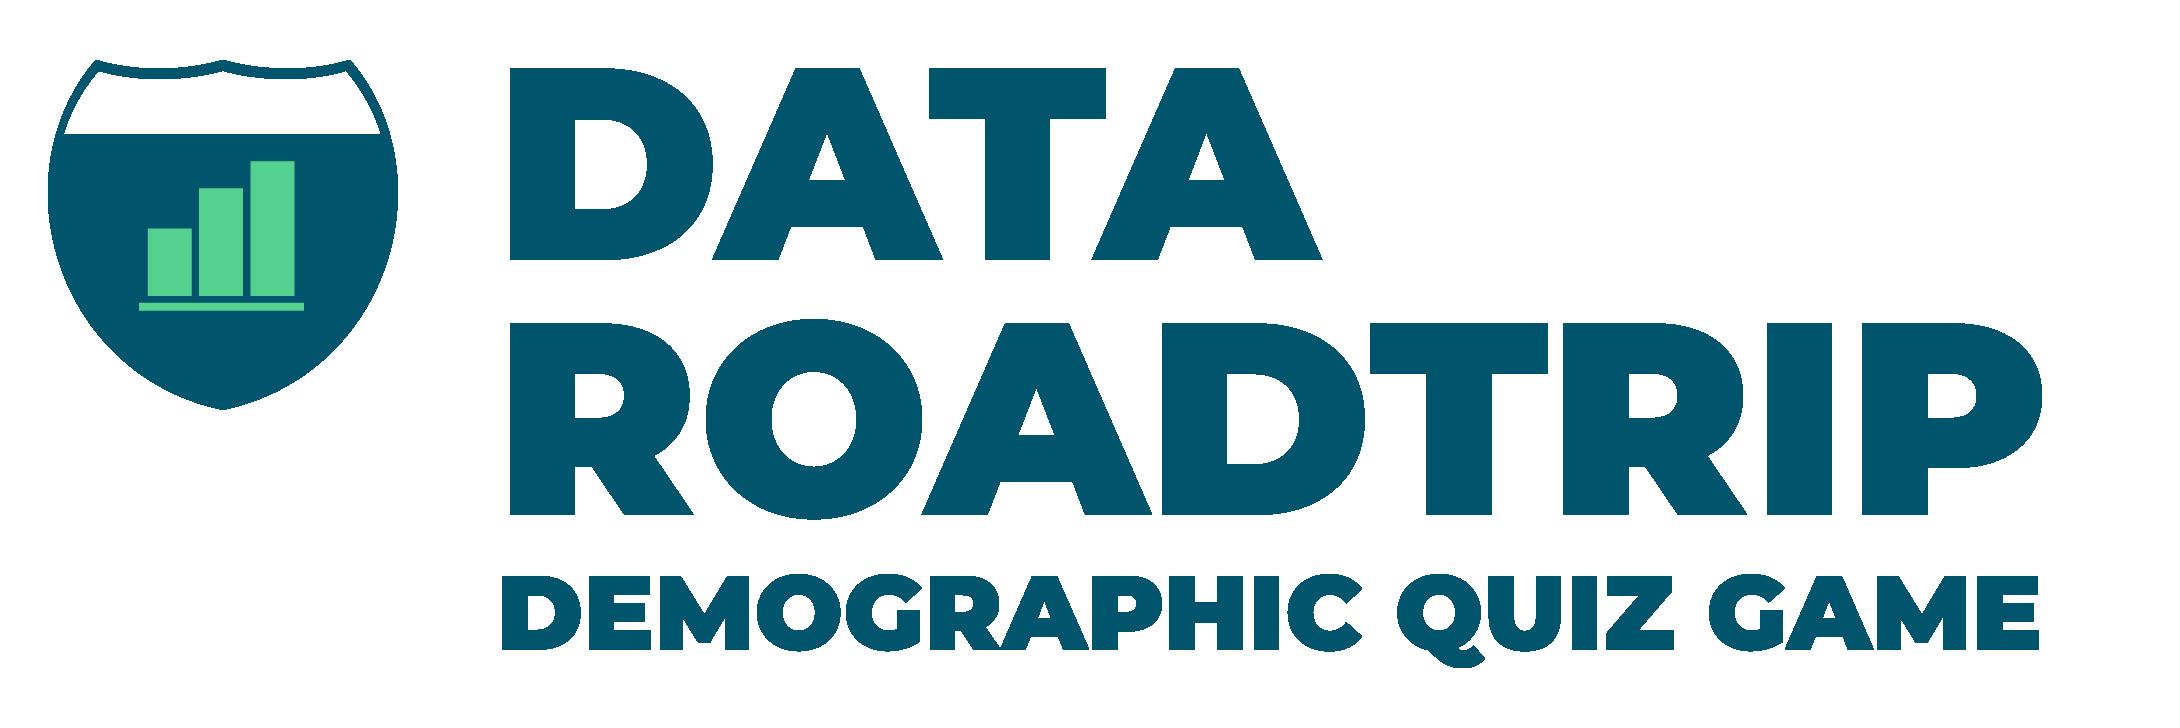 Data Roadtrip logo